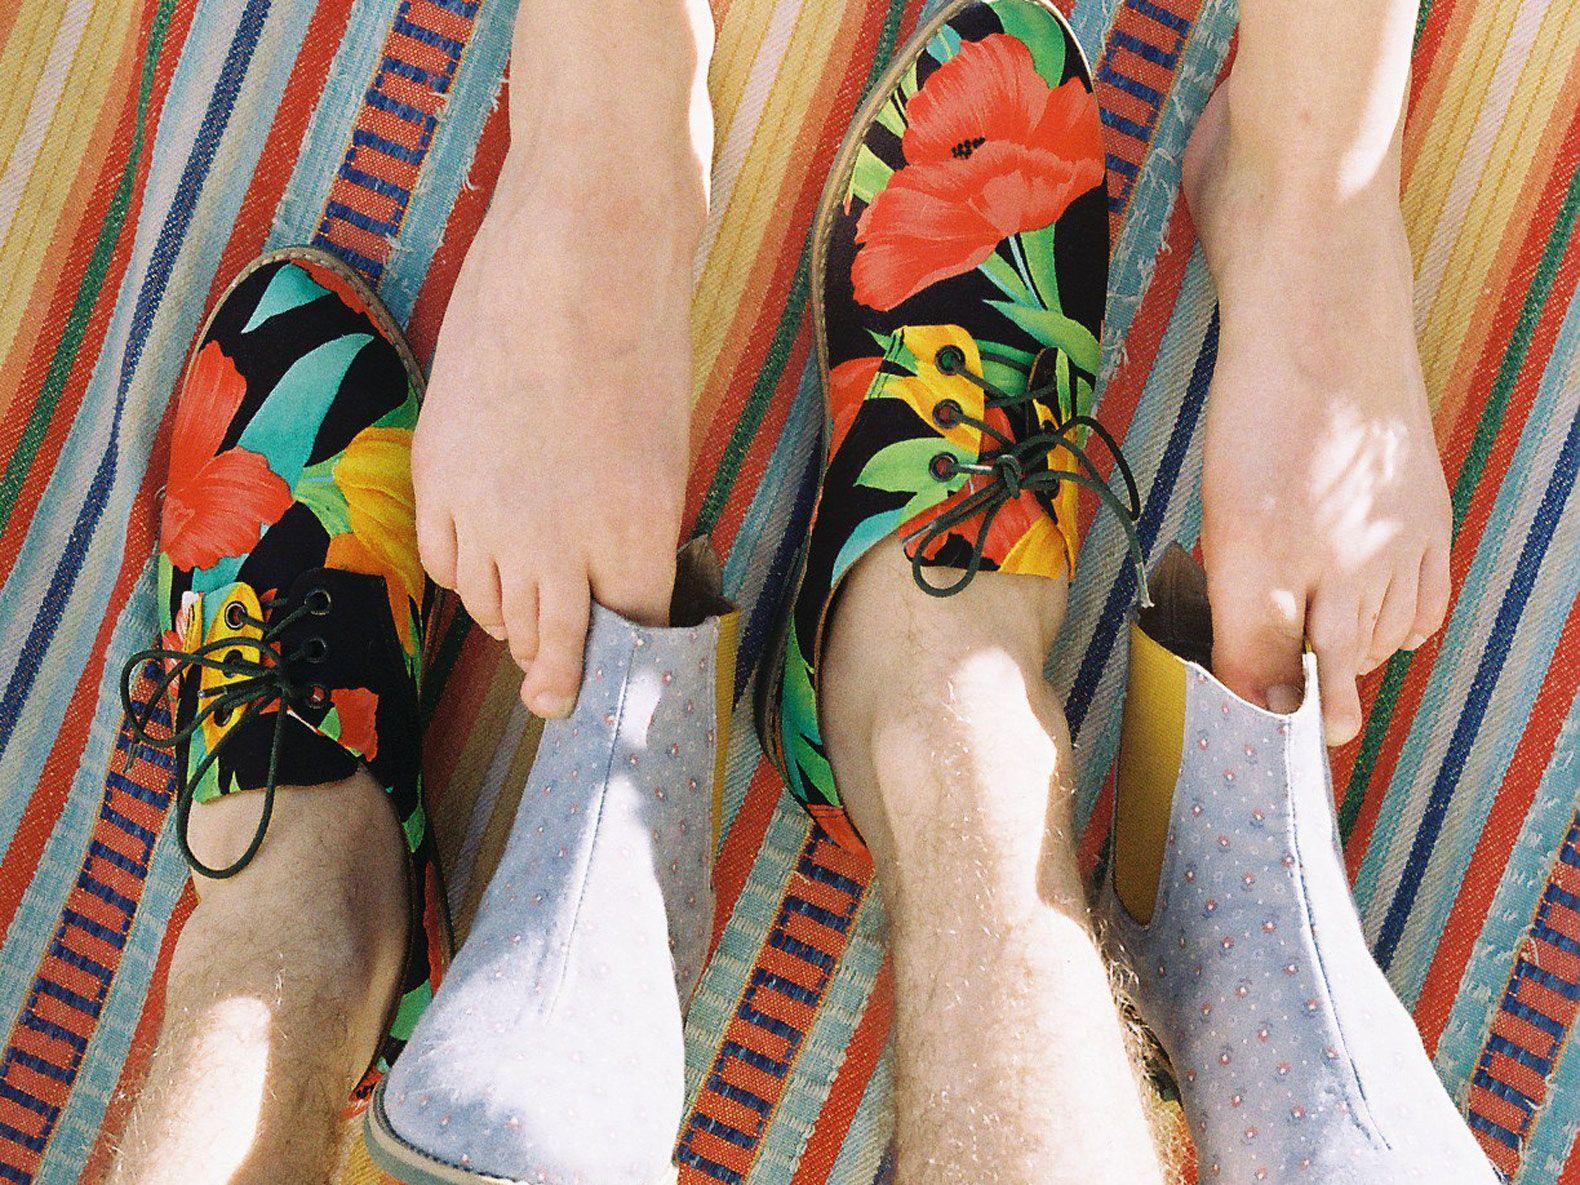 Insecta Shoes, Brazil, vegan fashion